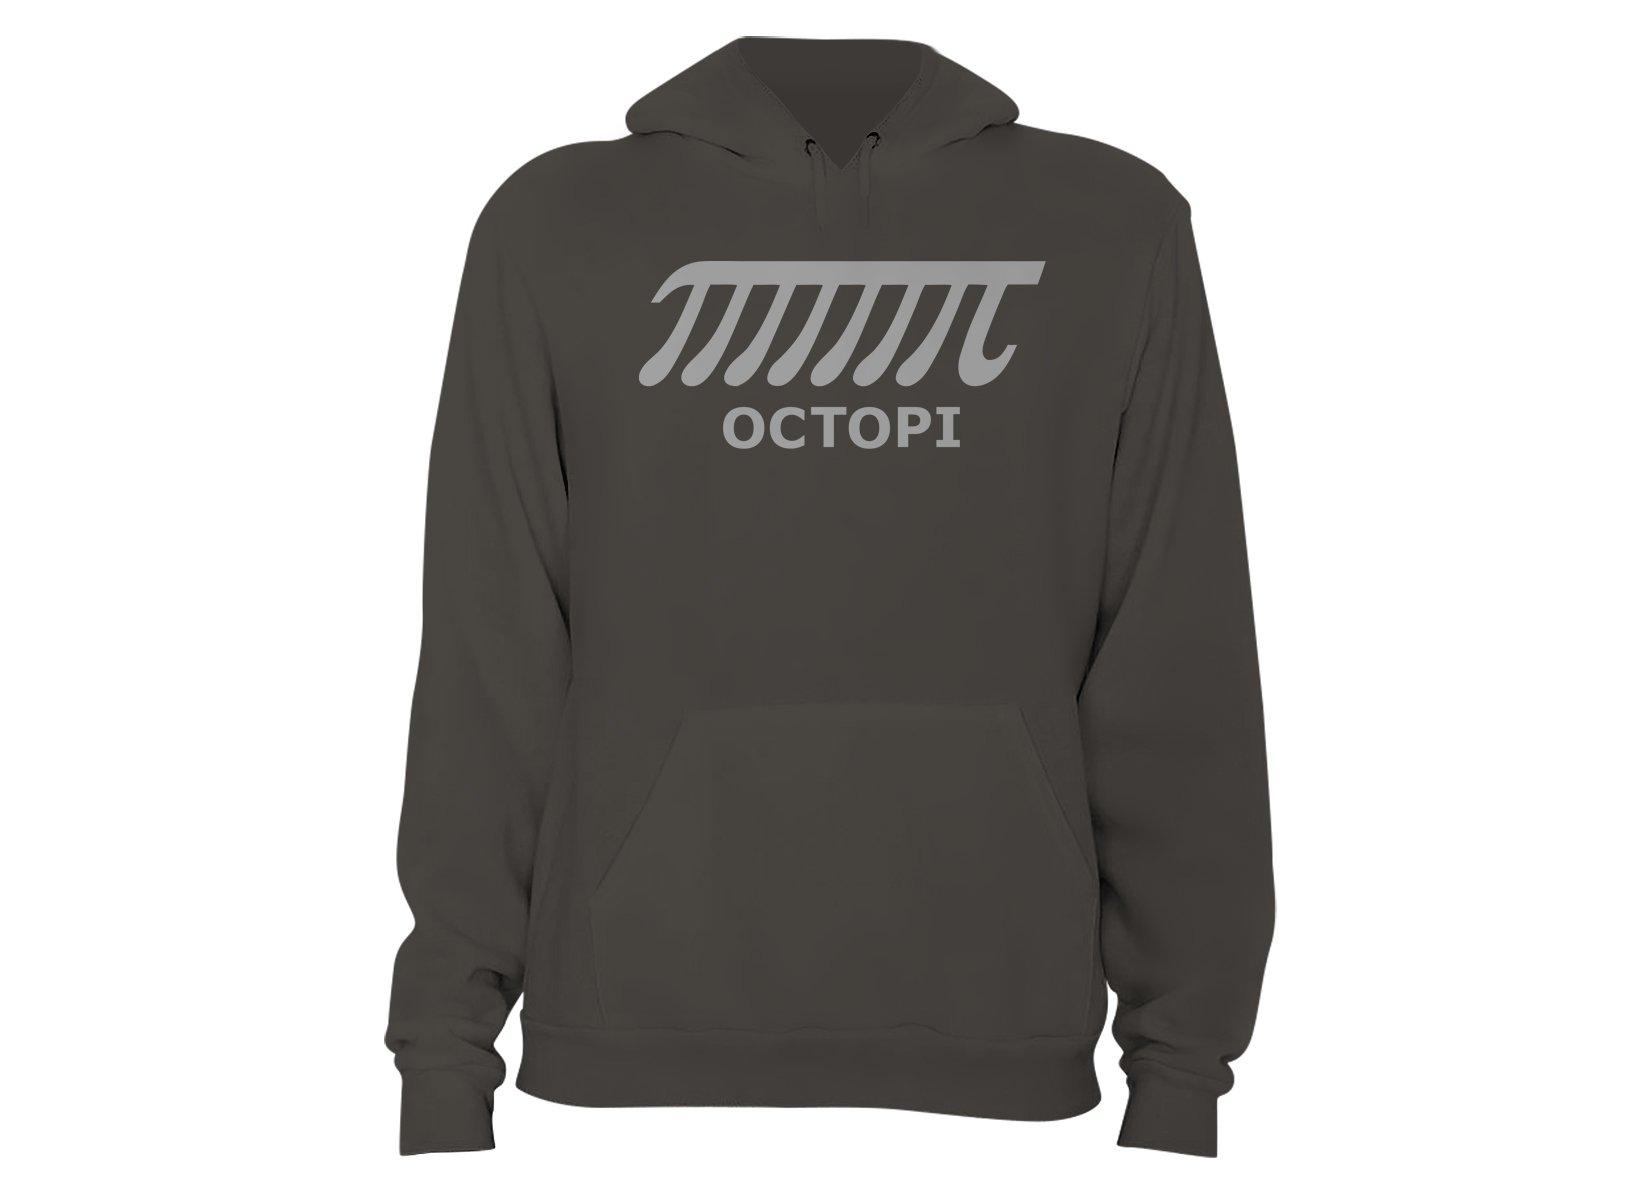 Octopi on Hoodie